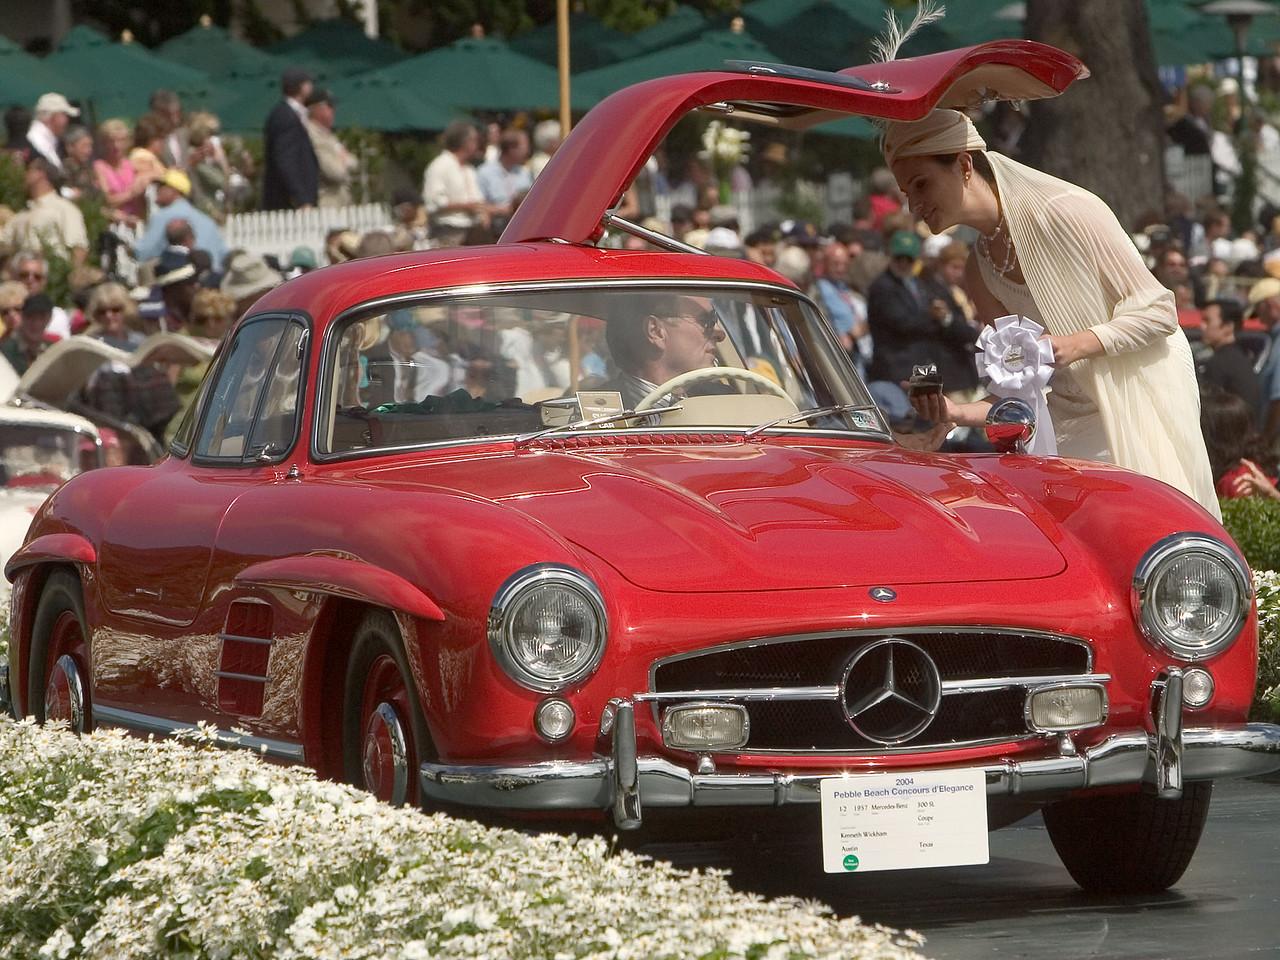 1957 Mercedes-Benz 300 SL Coupe. 3rd Mercedes 300 SL.  Kenneth Wickham.